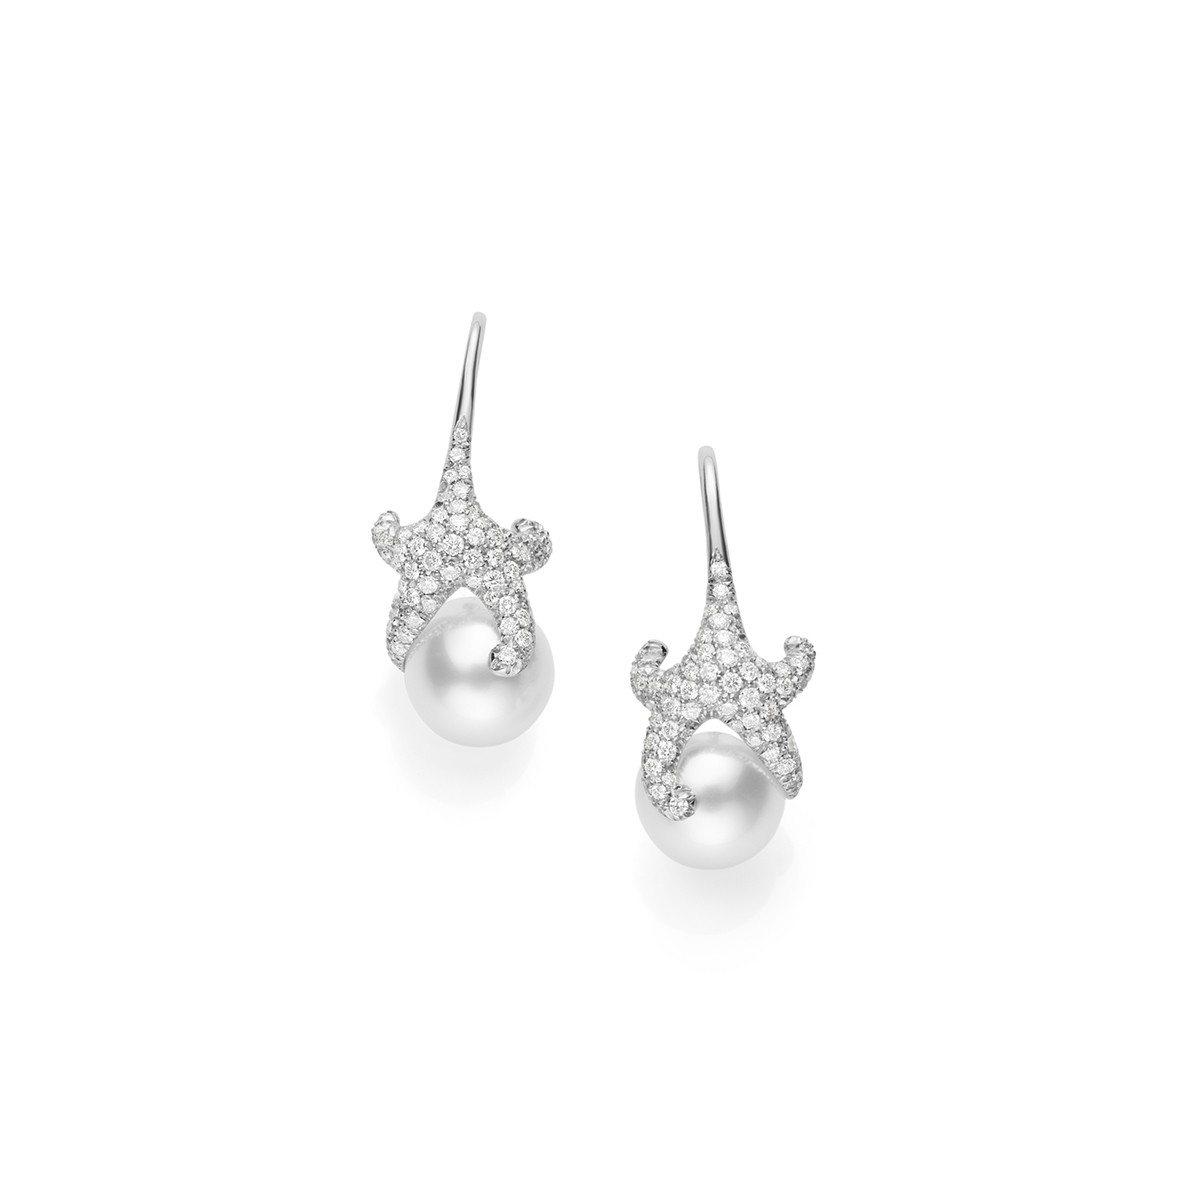 迪麗熱巴配戴的MIKIMOTO Milano Collection 南洋珍珠鑽石...